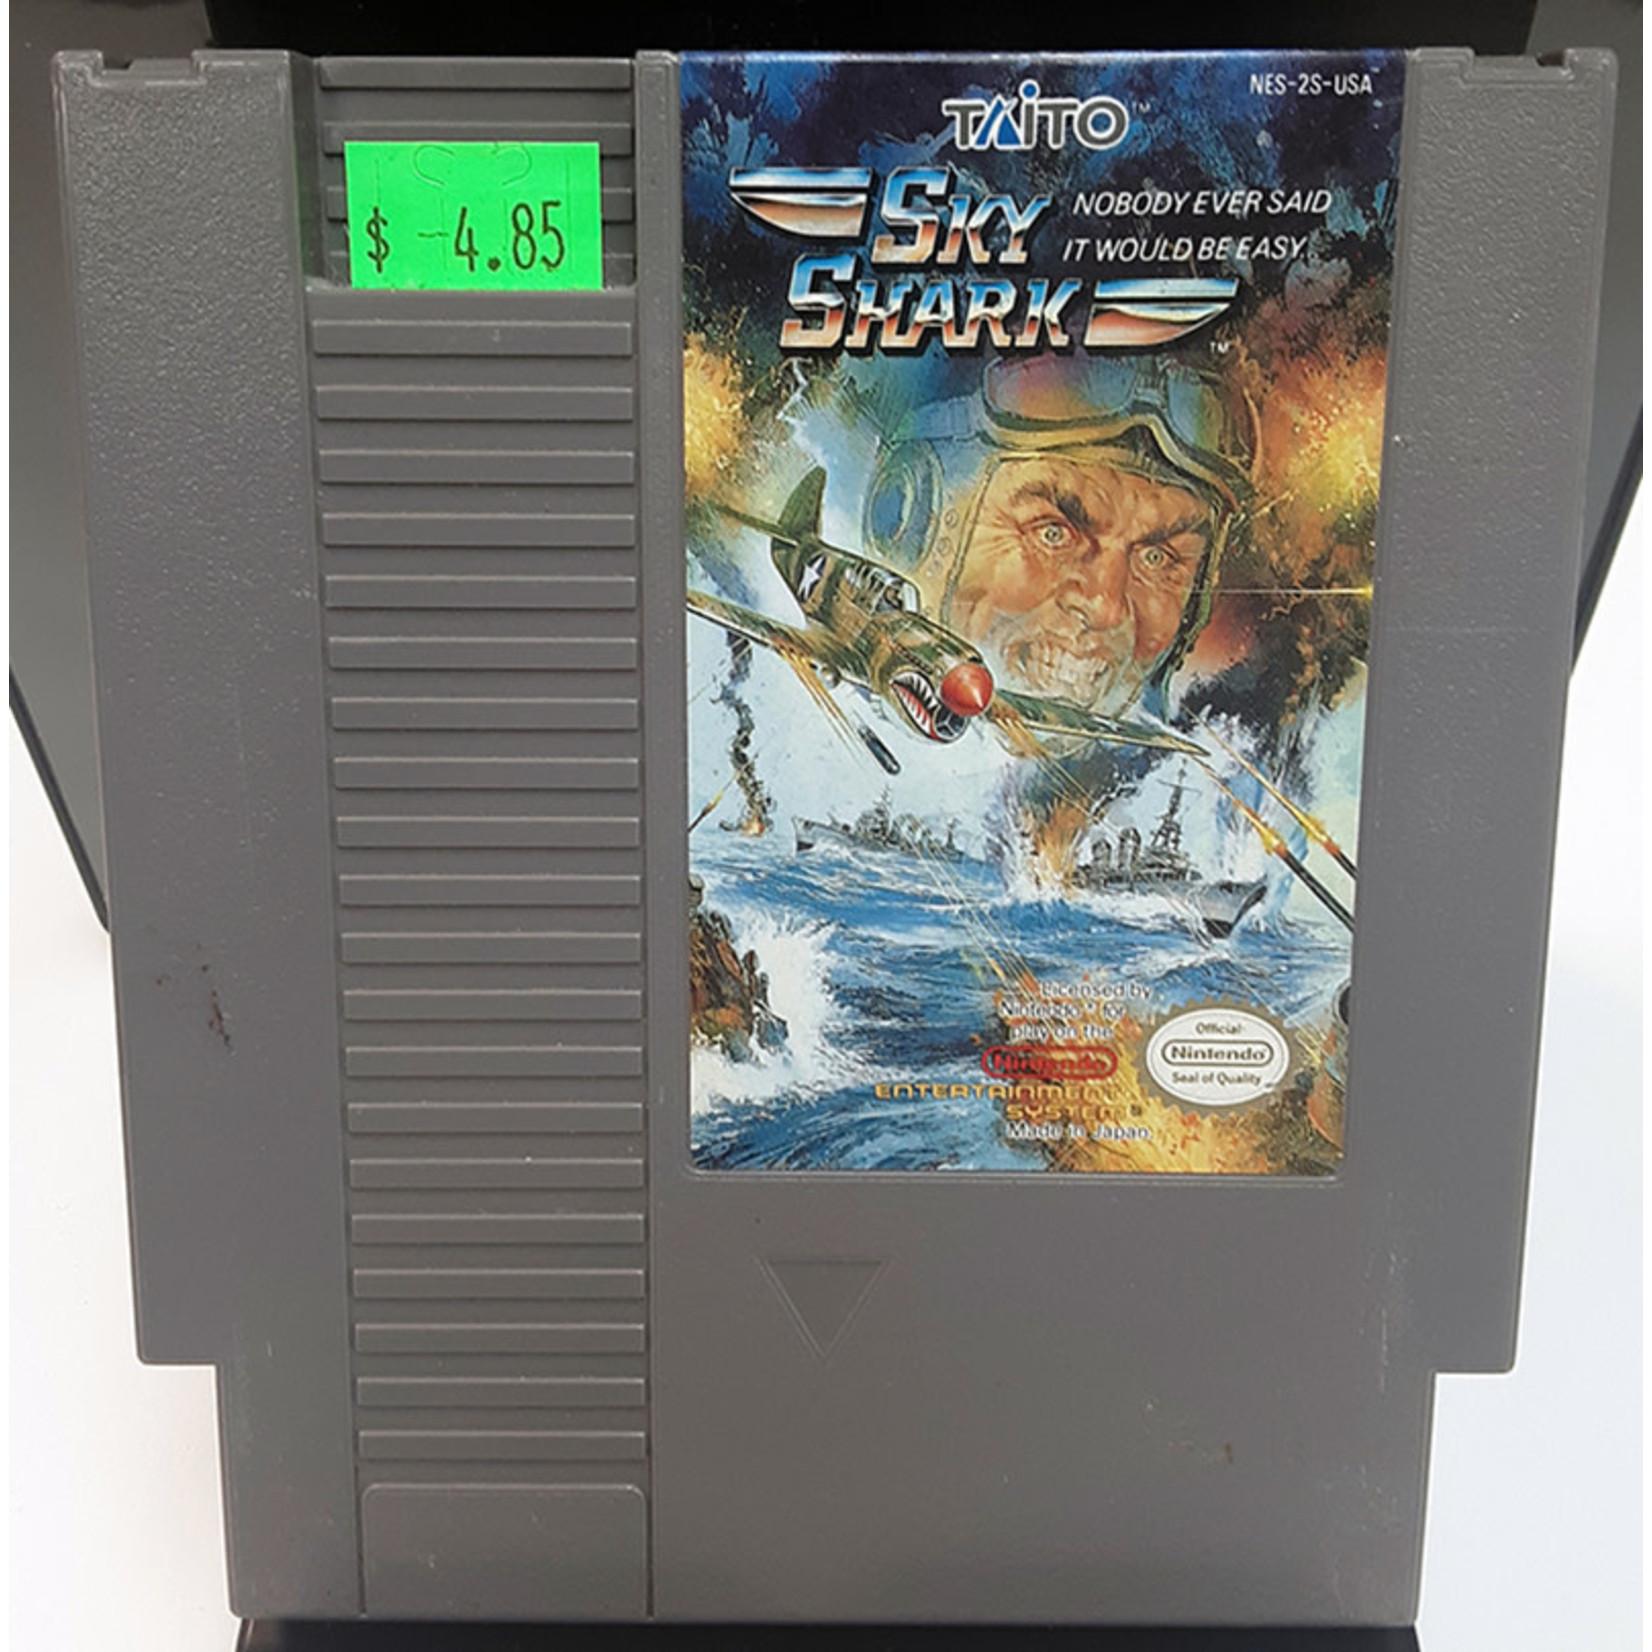 NESU-Sky Shark (cartridge)